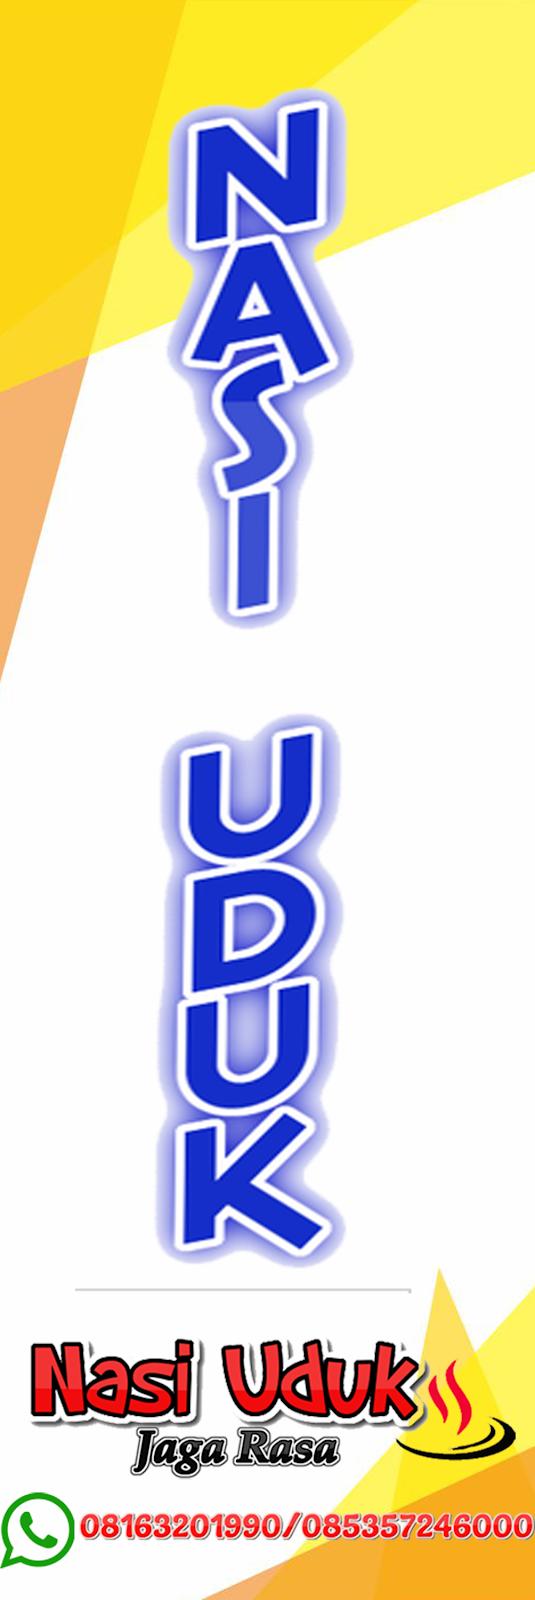 Spanduk Nasi Uduk : spanduk, Contoh, Desain, Banner